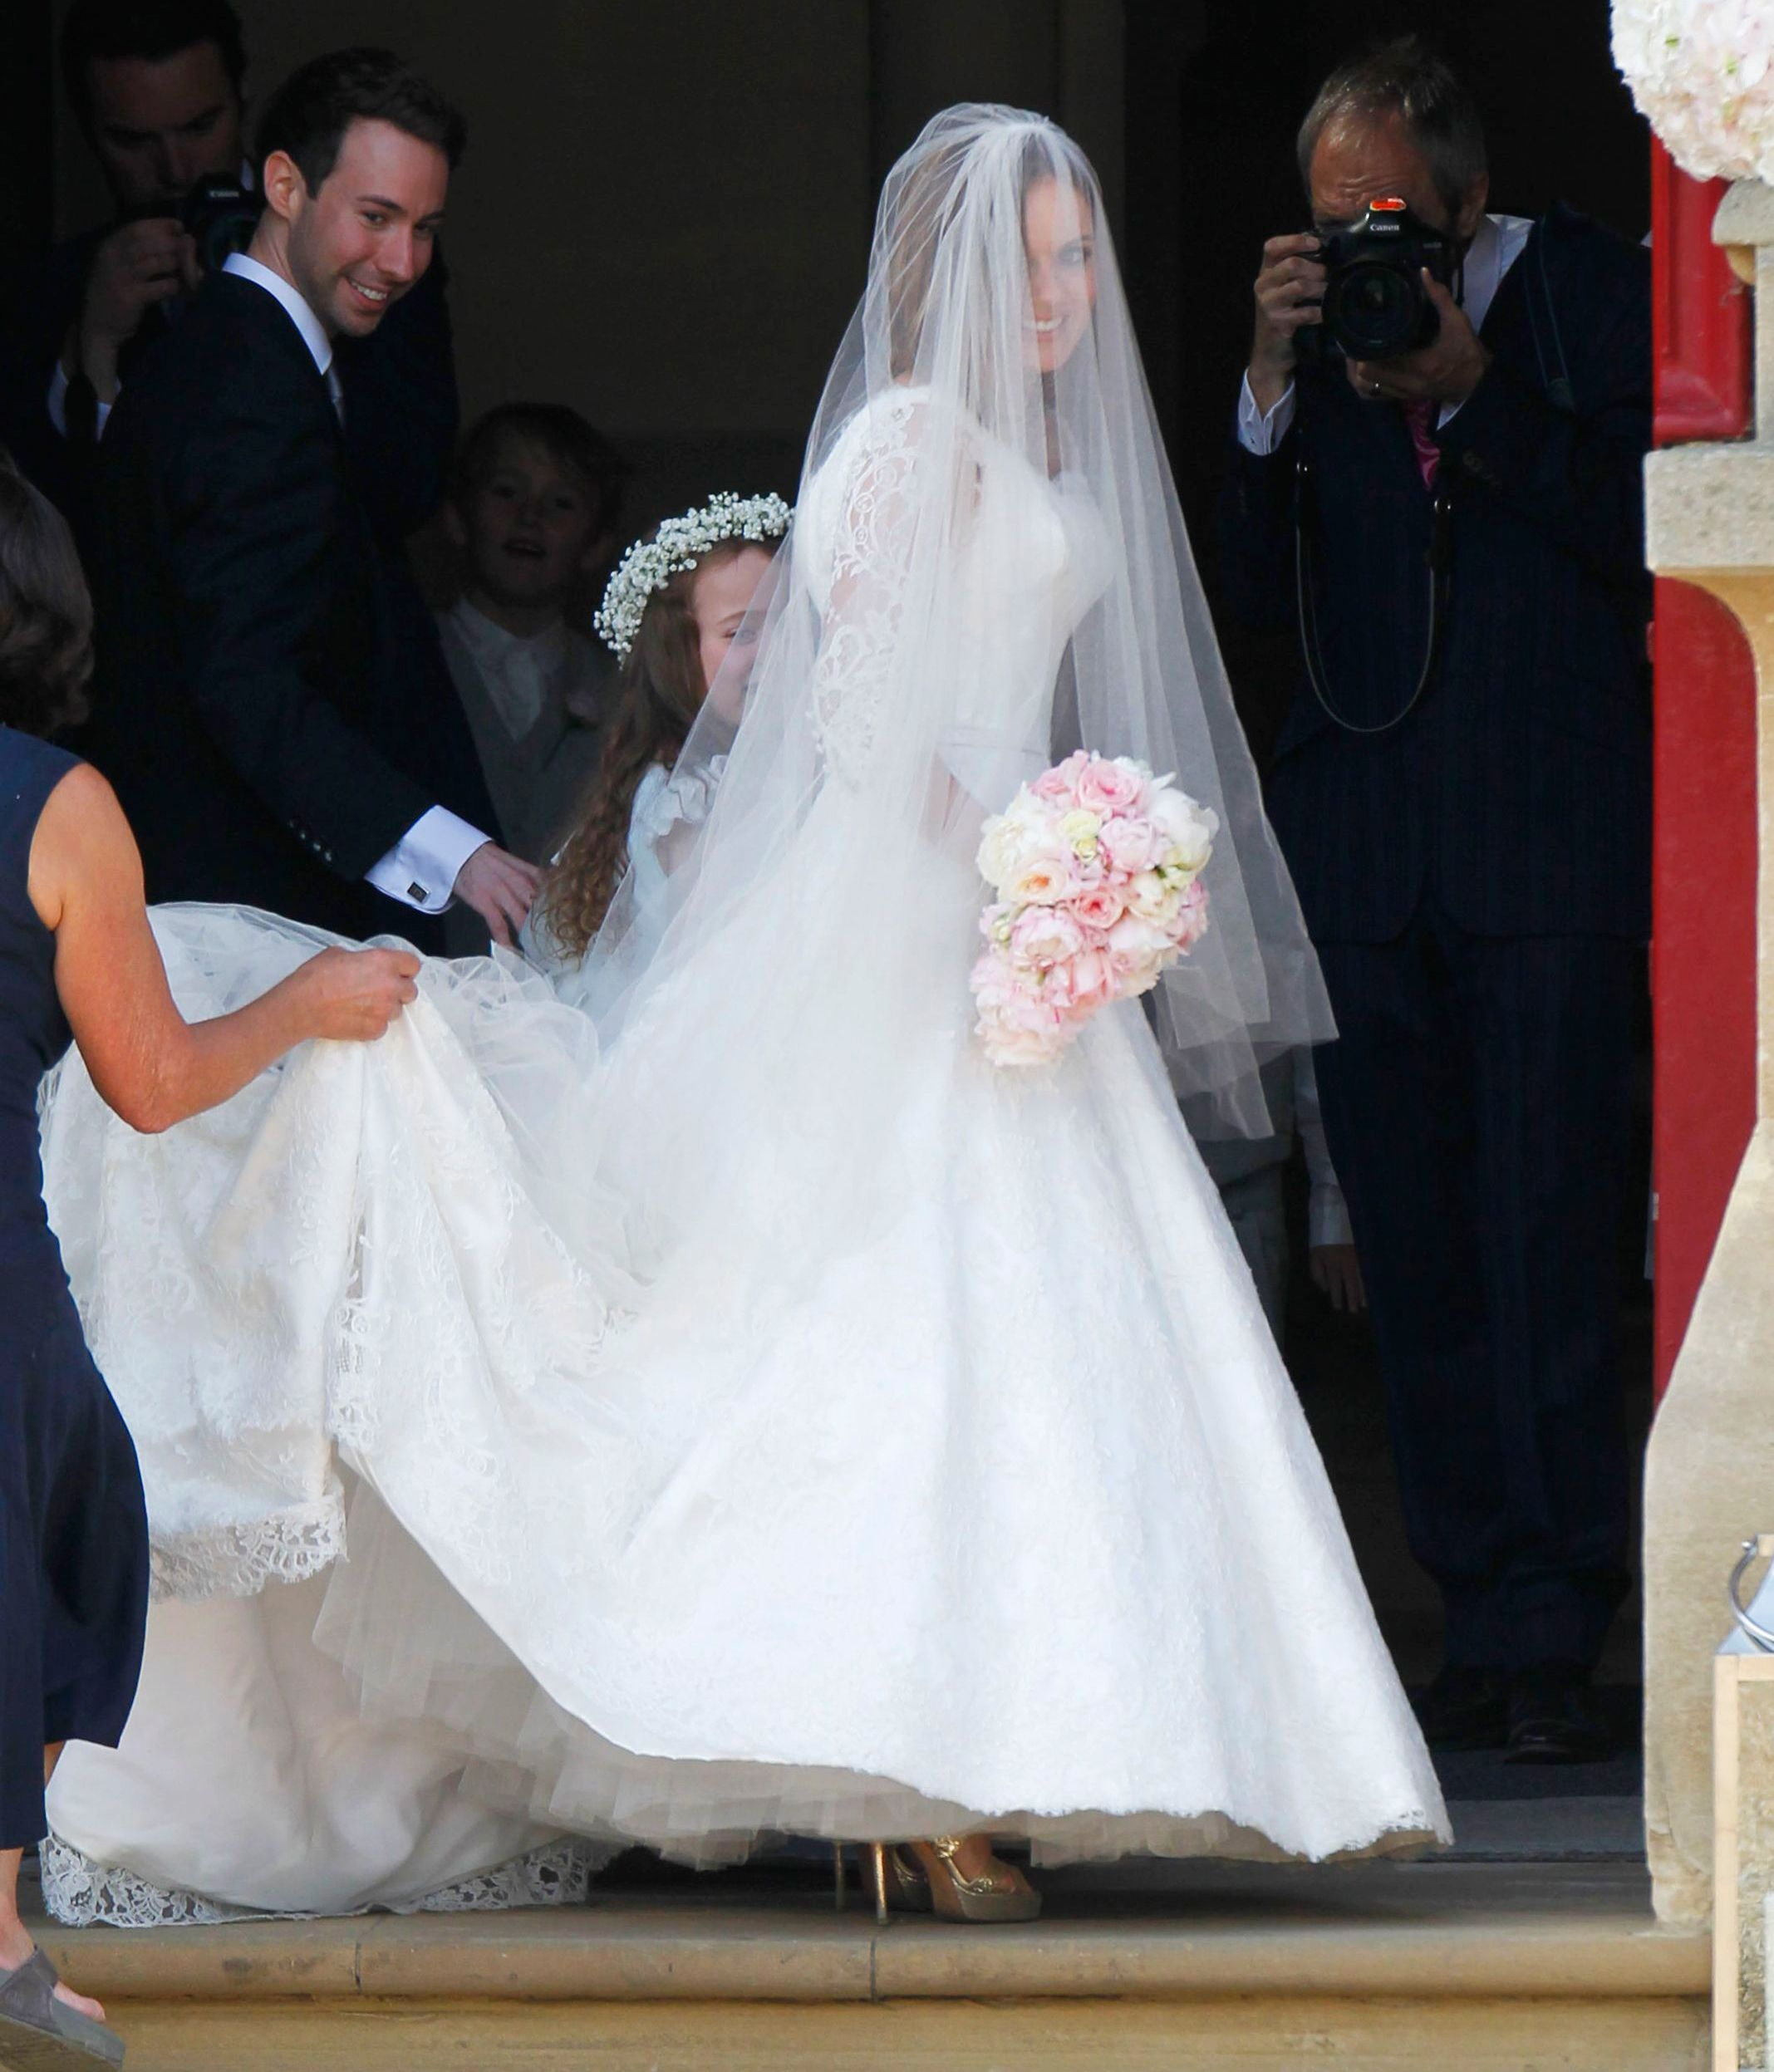 Sims 4 Wedding Veil.Sims 4 Wedding Dress And Veil Saddha